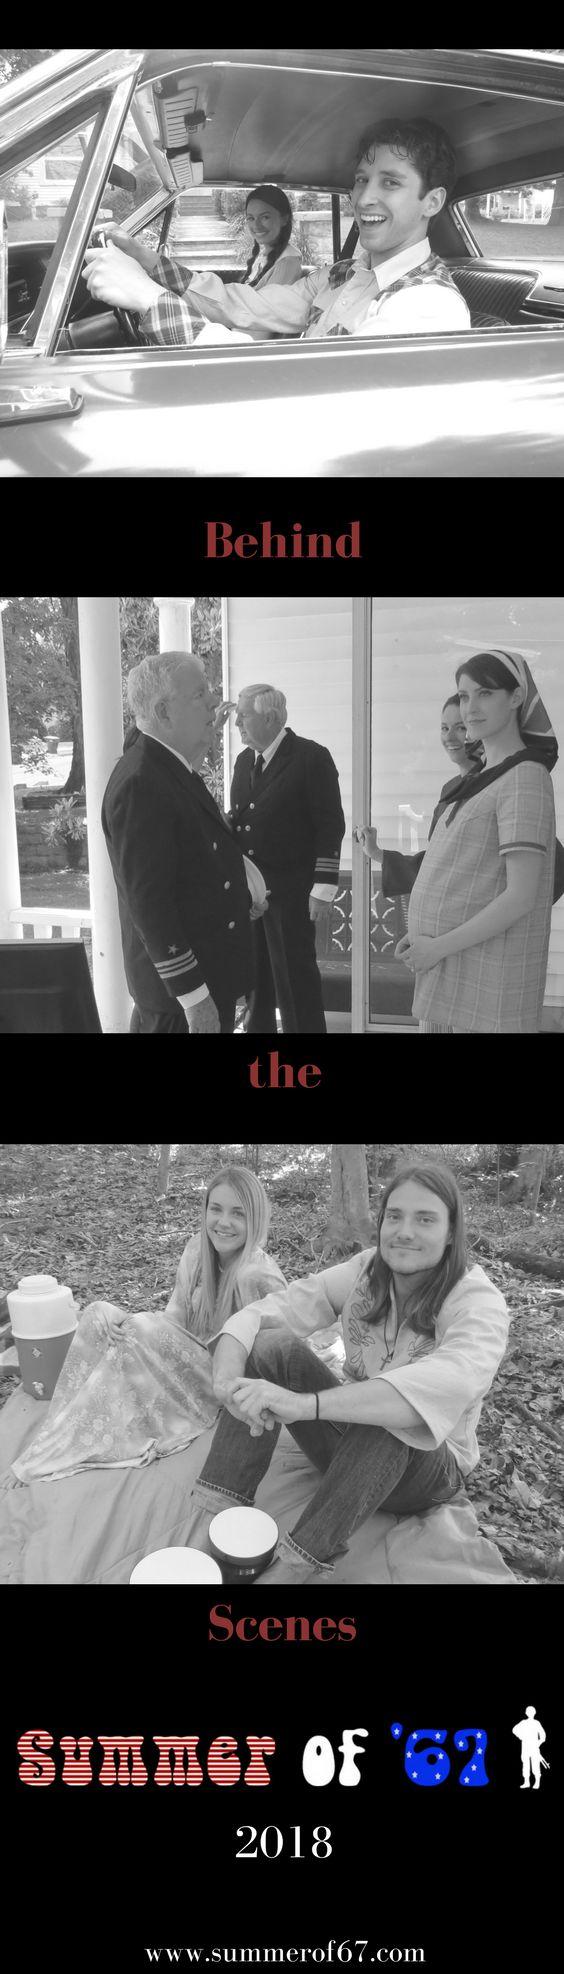 Summer of '67, behind the scenes, Vietnam War love story, indie movie, www.summerof67.com, love story, indie movie, coming 2018,, hippies, hippie protest, hippie fashions, vintage fashions, 1960's fashions, hippie style, period movie,